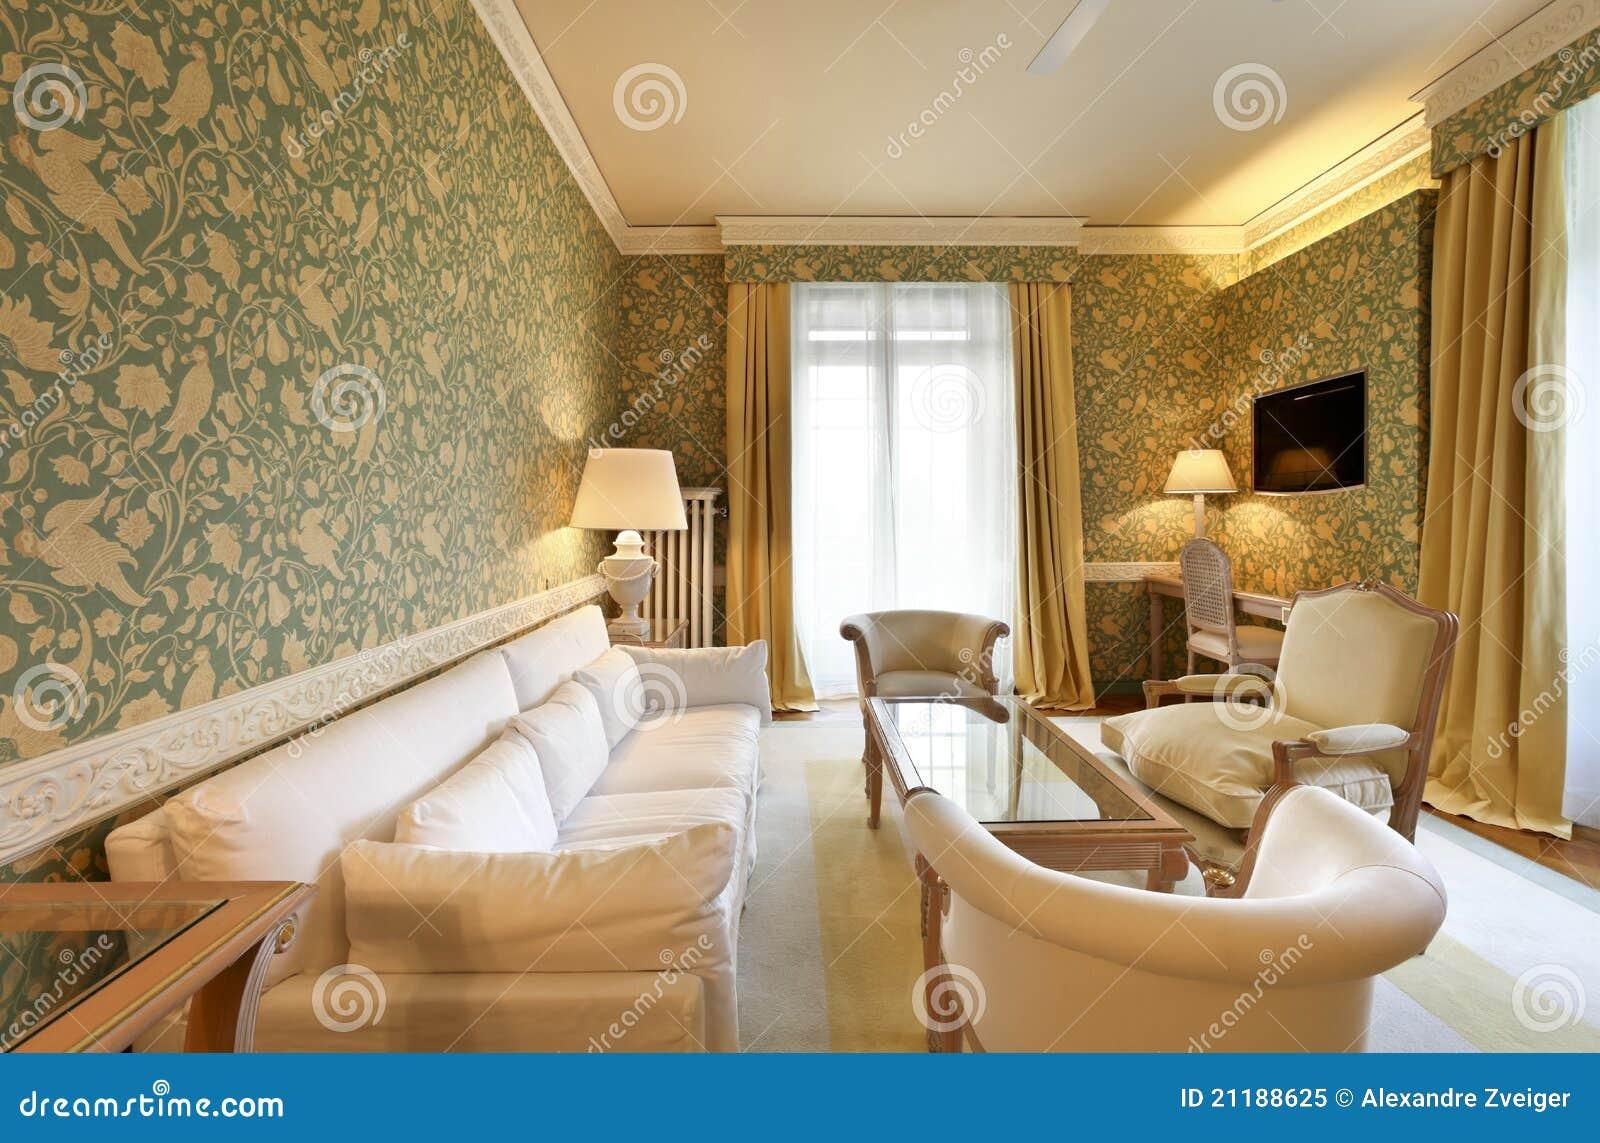 Comfortable suit, lounge